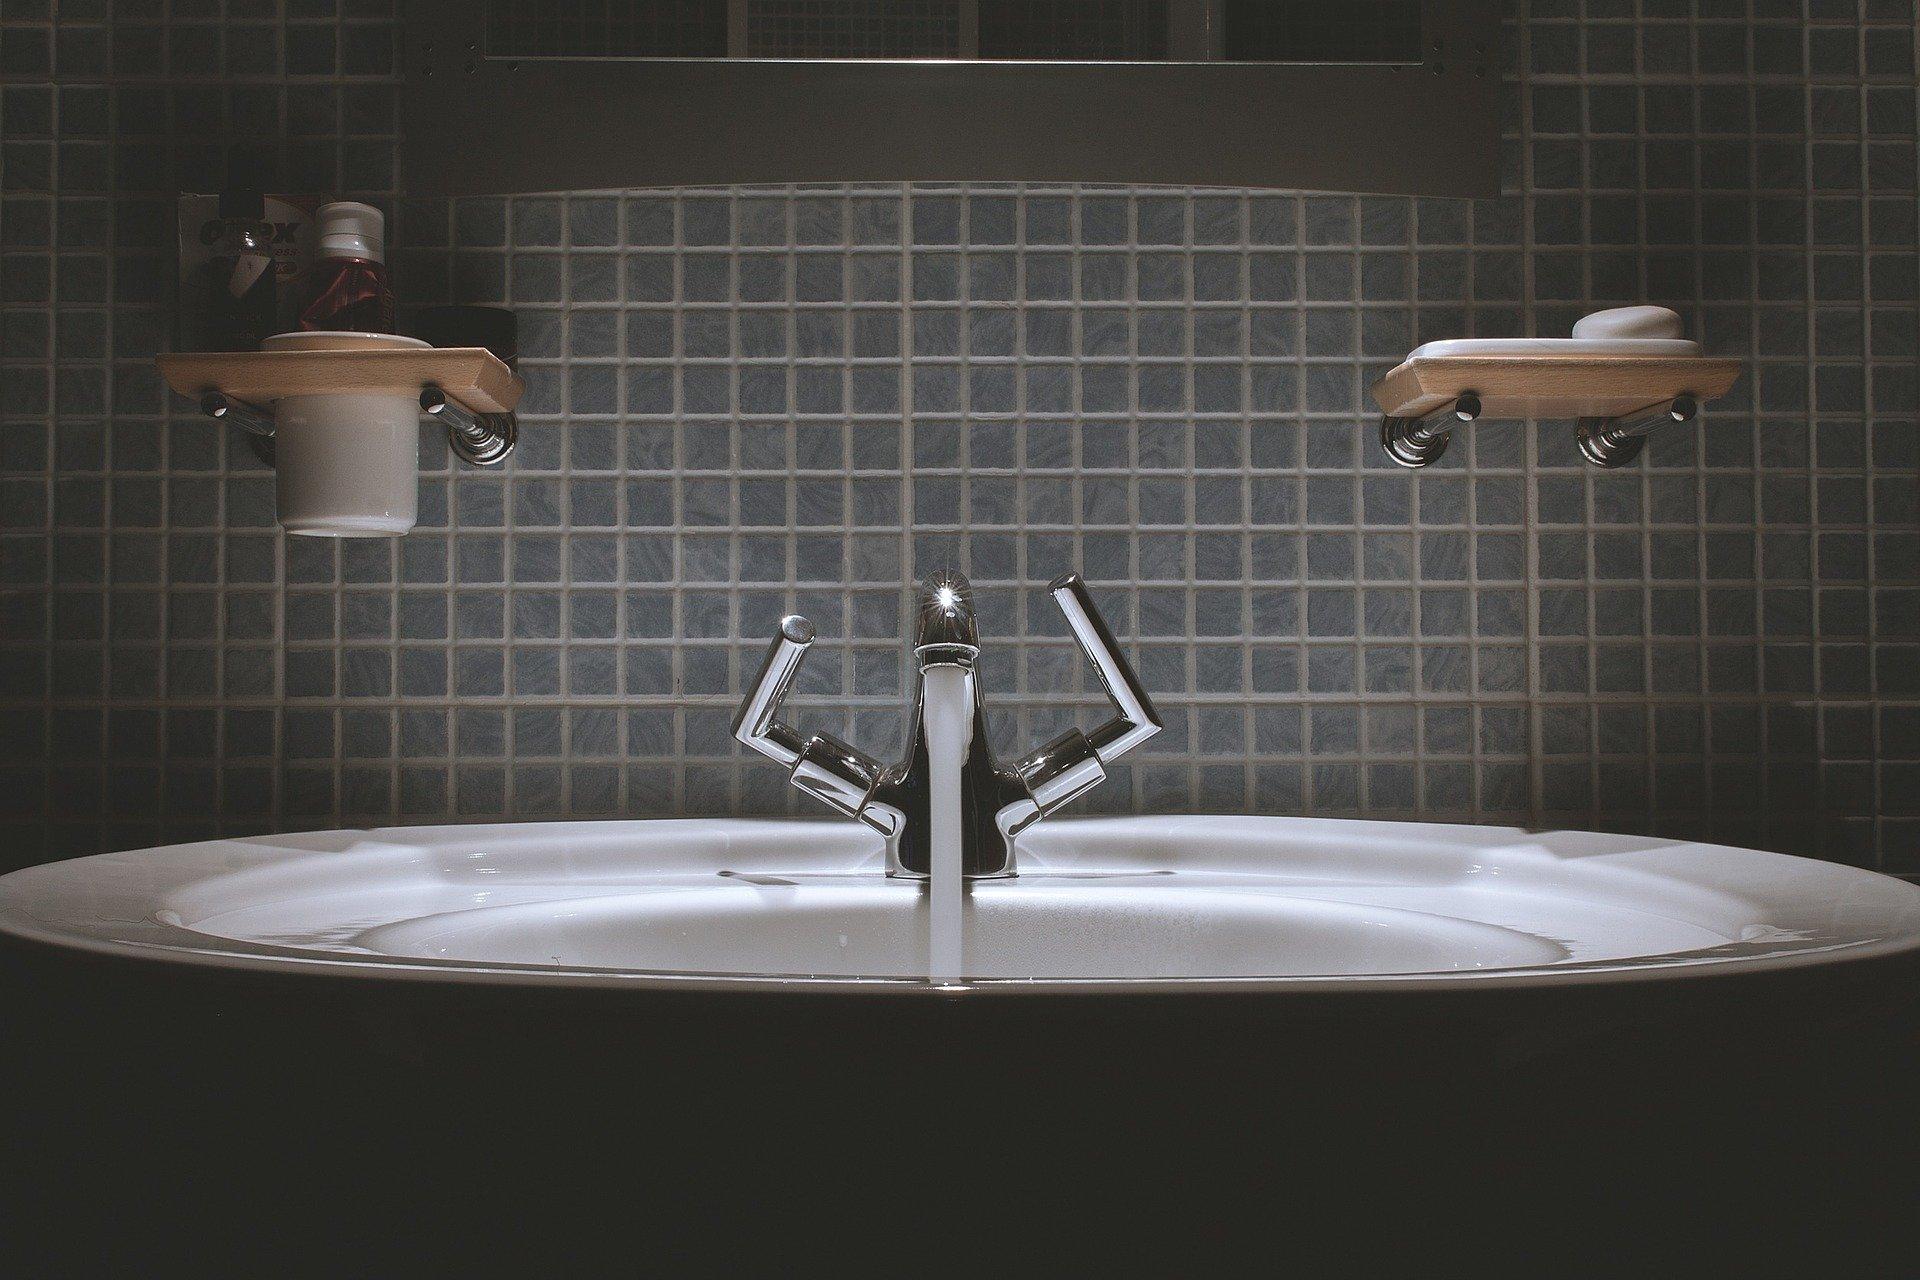 Decorer Sa Salle De Bain Soi Meme rénover salle de bain : découvrez nos idées